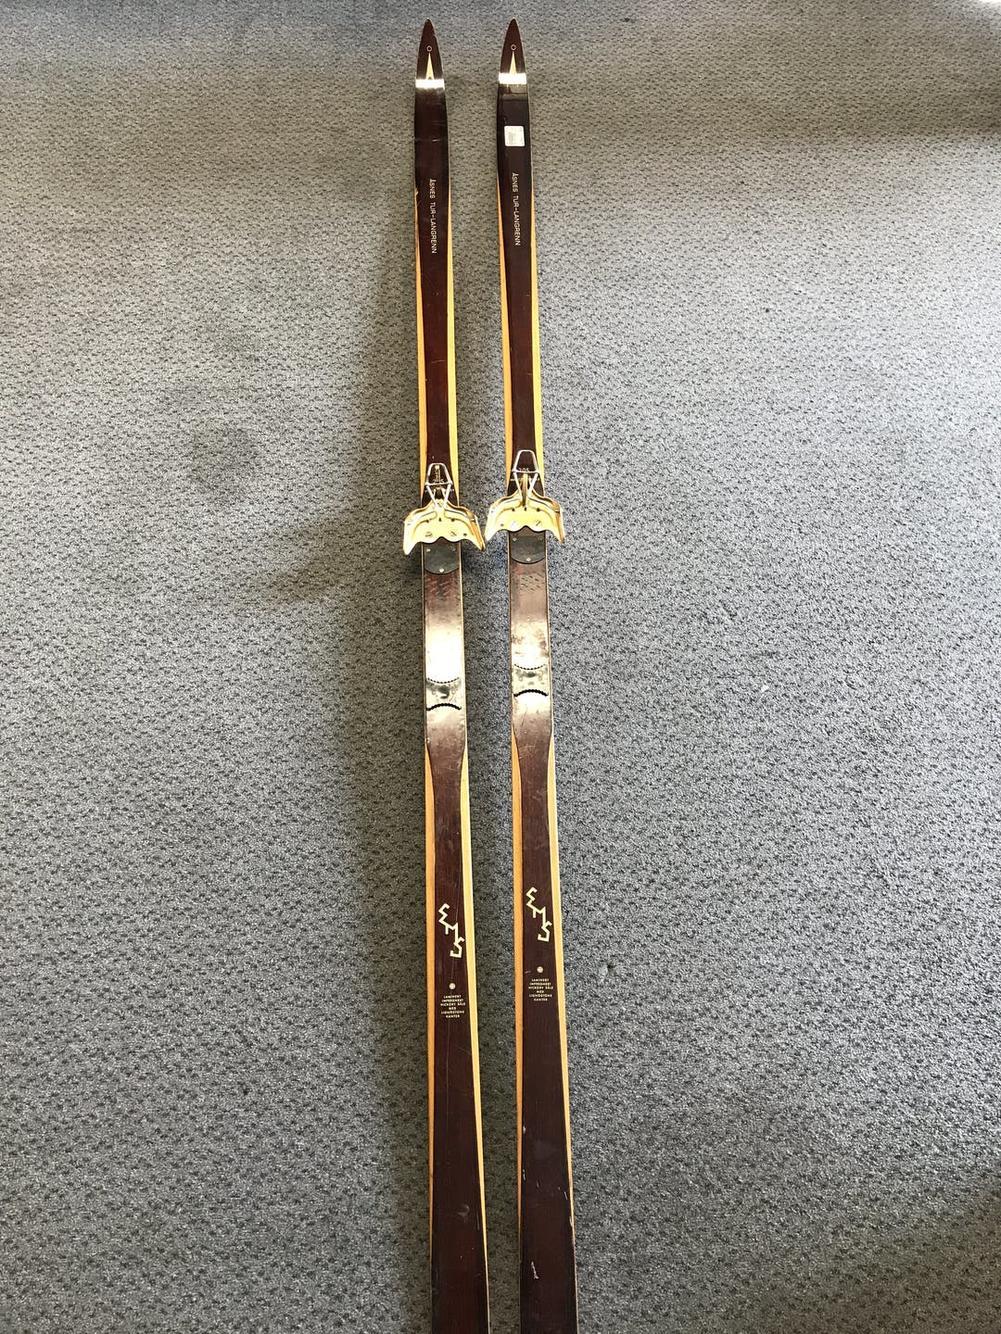 Vintage Asnes Tur Langrenn 205cm Hickory Cross Country W Skilom Bindings Skiing Skis